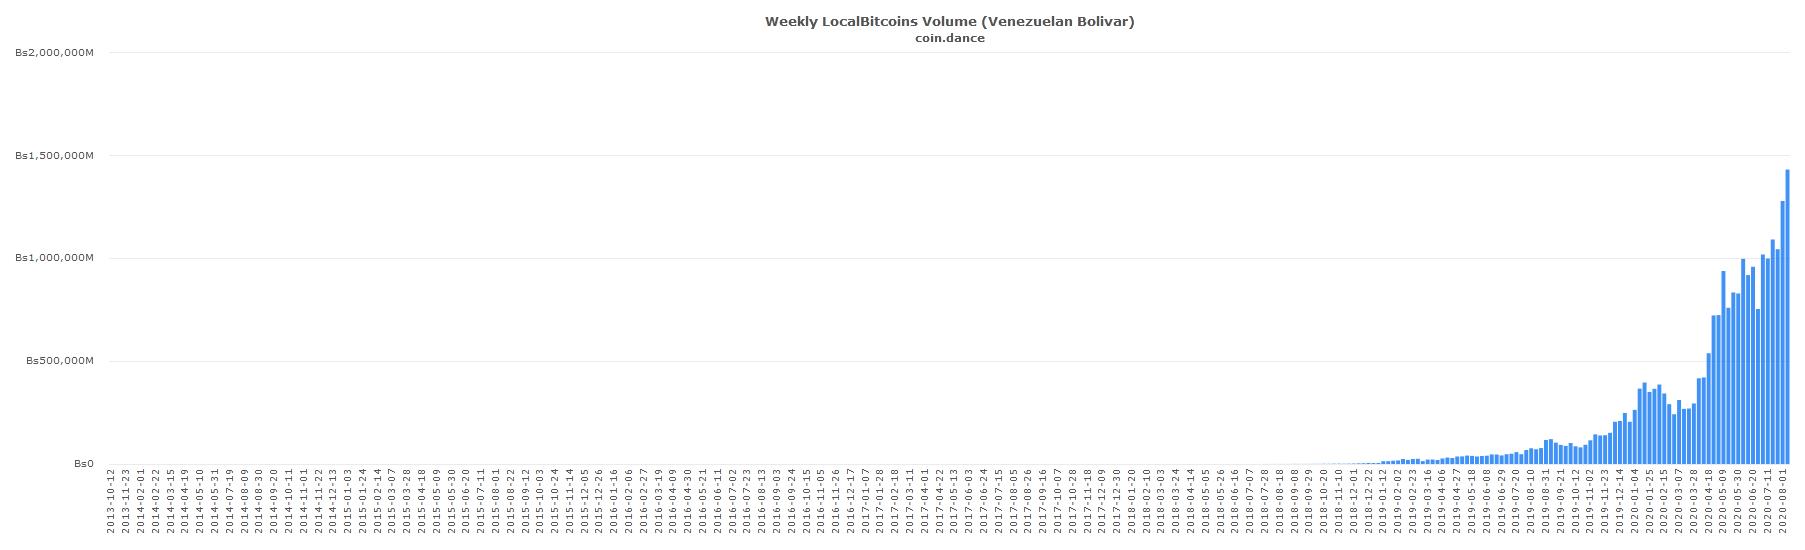 Bitcoin Trading Volume in Venezuela Peaks Again